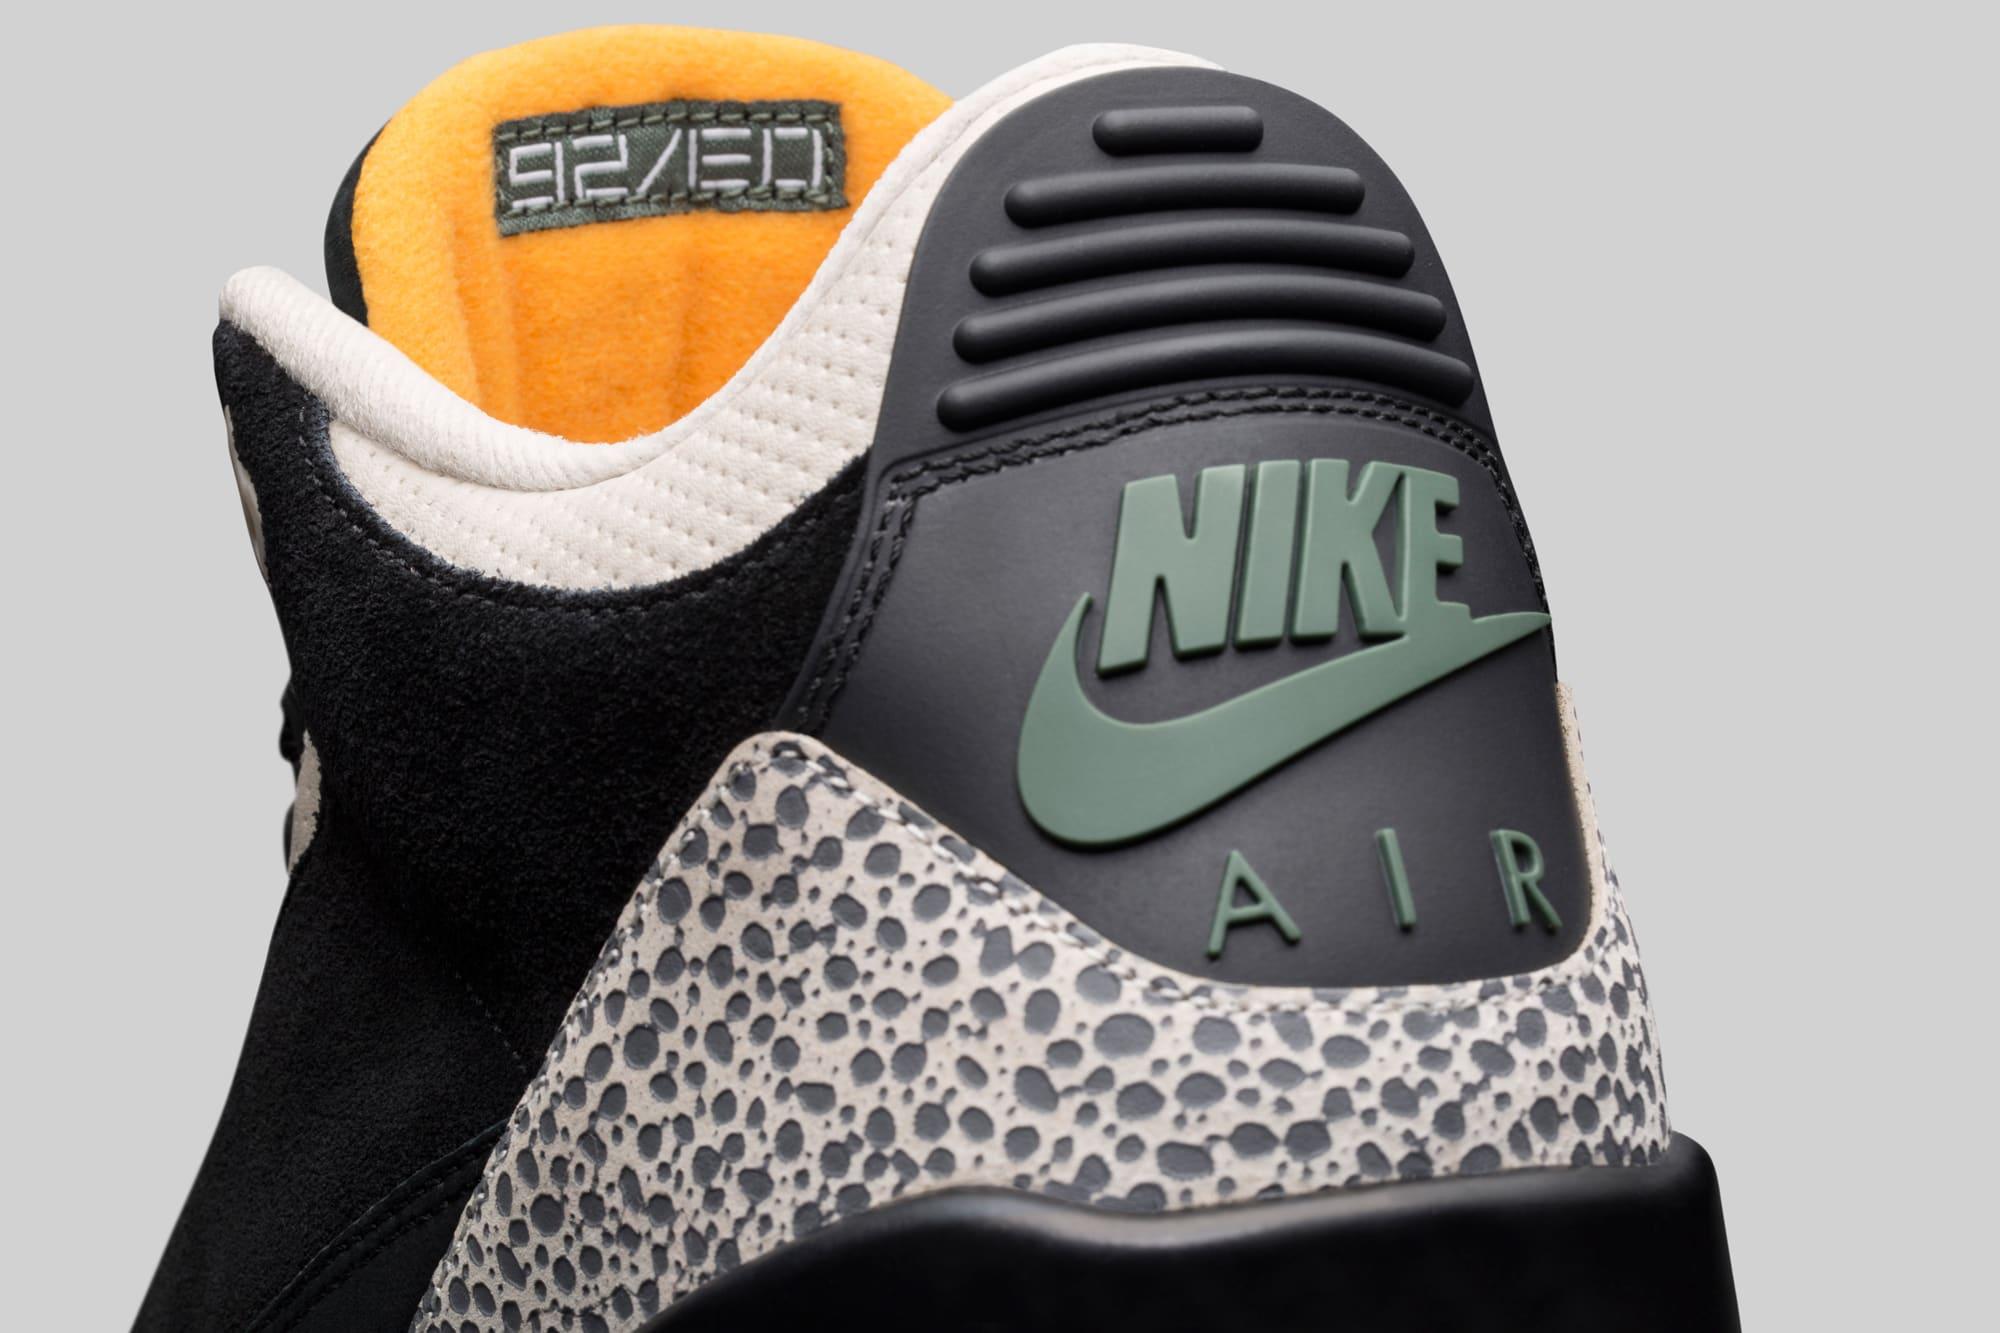 Atmos Air Jordan 3 Heel